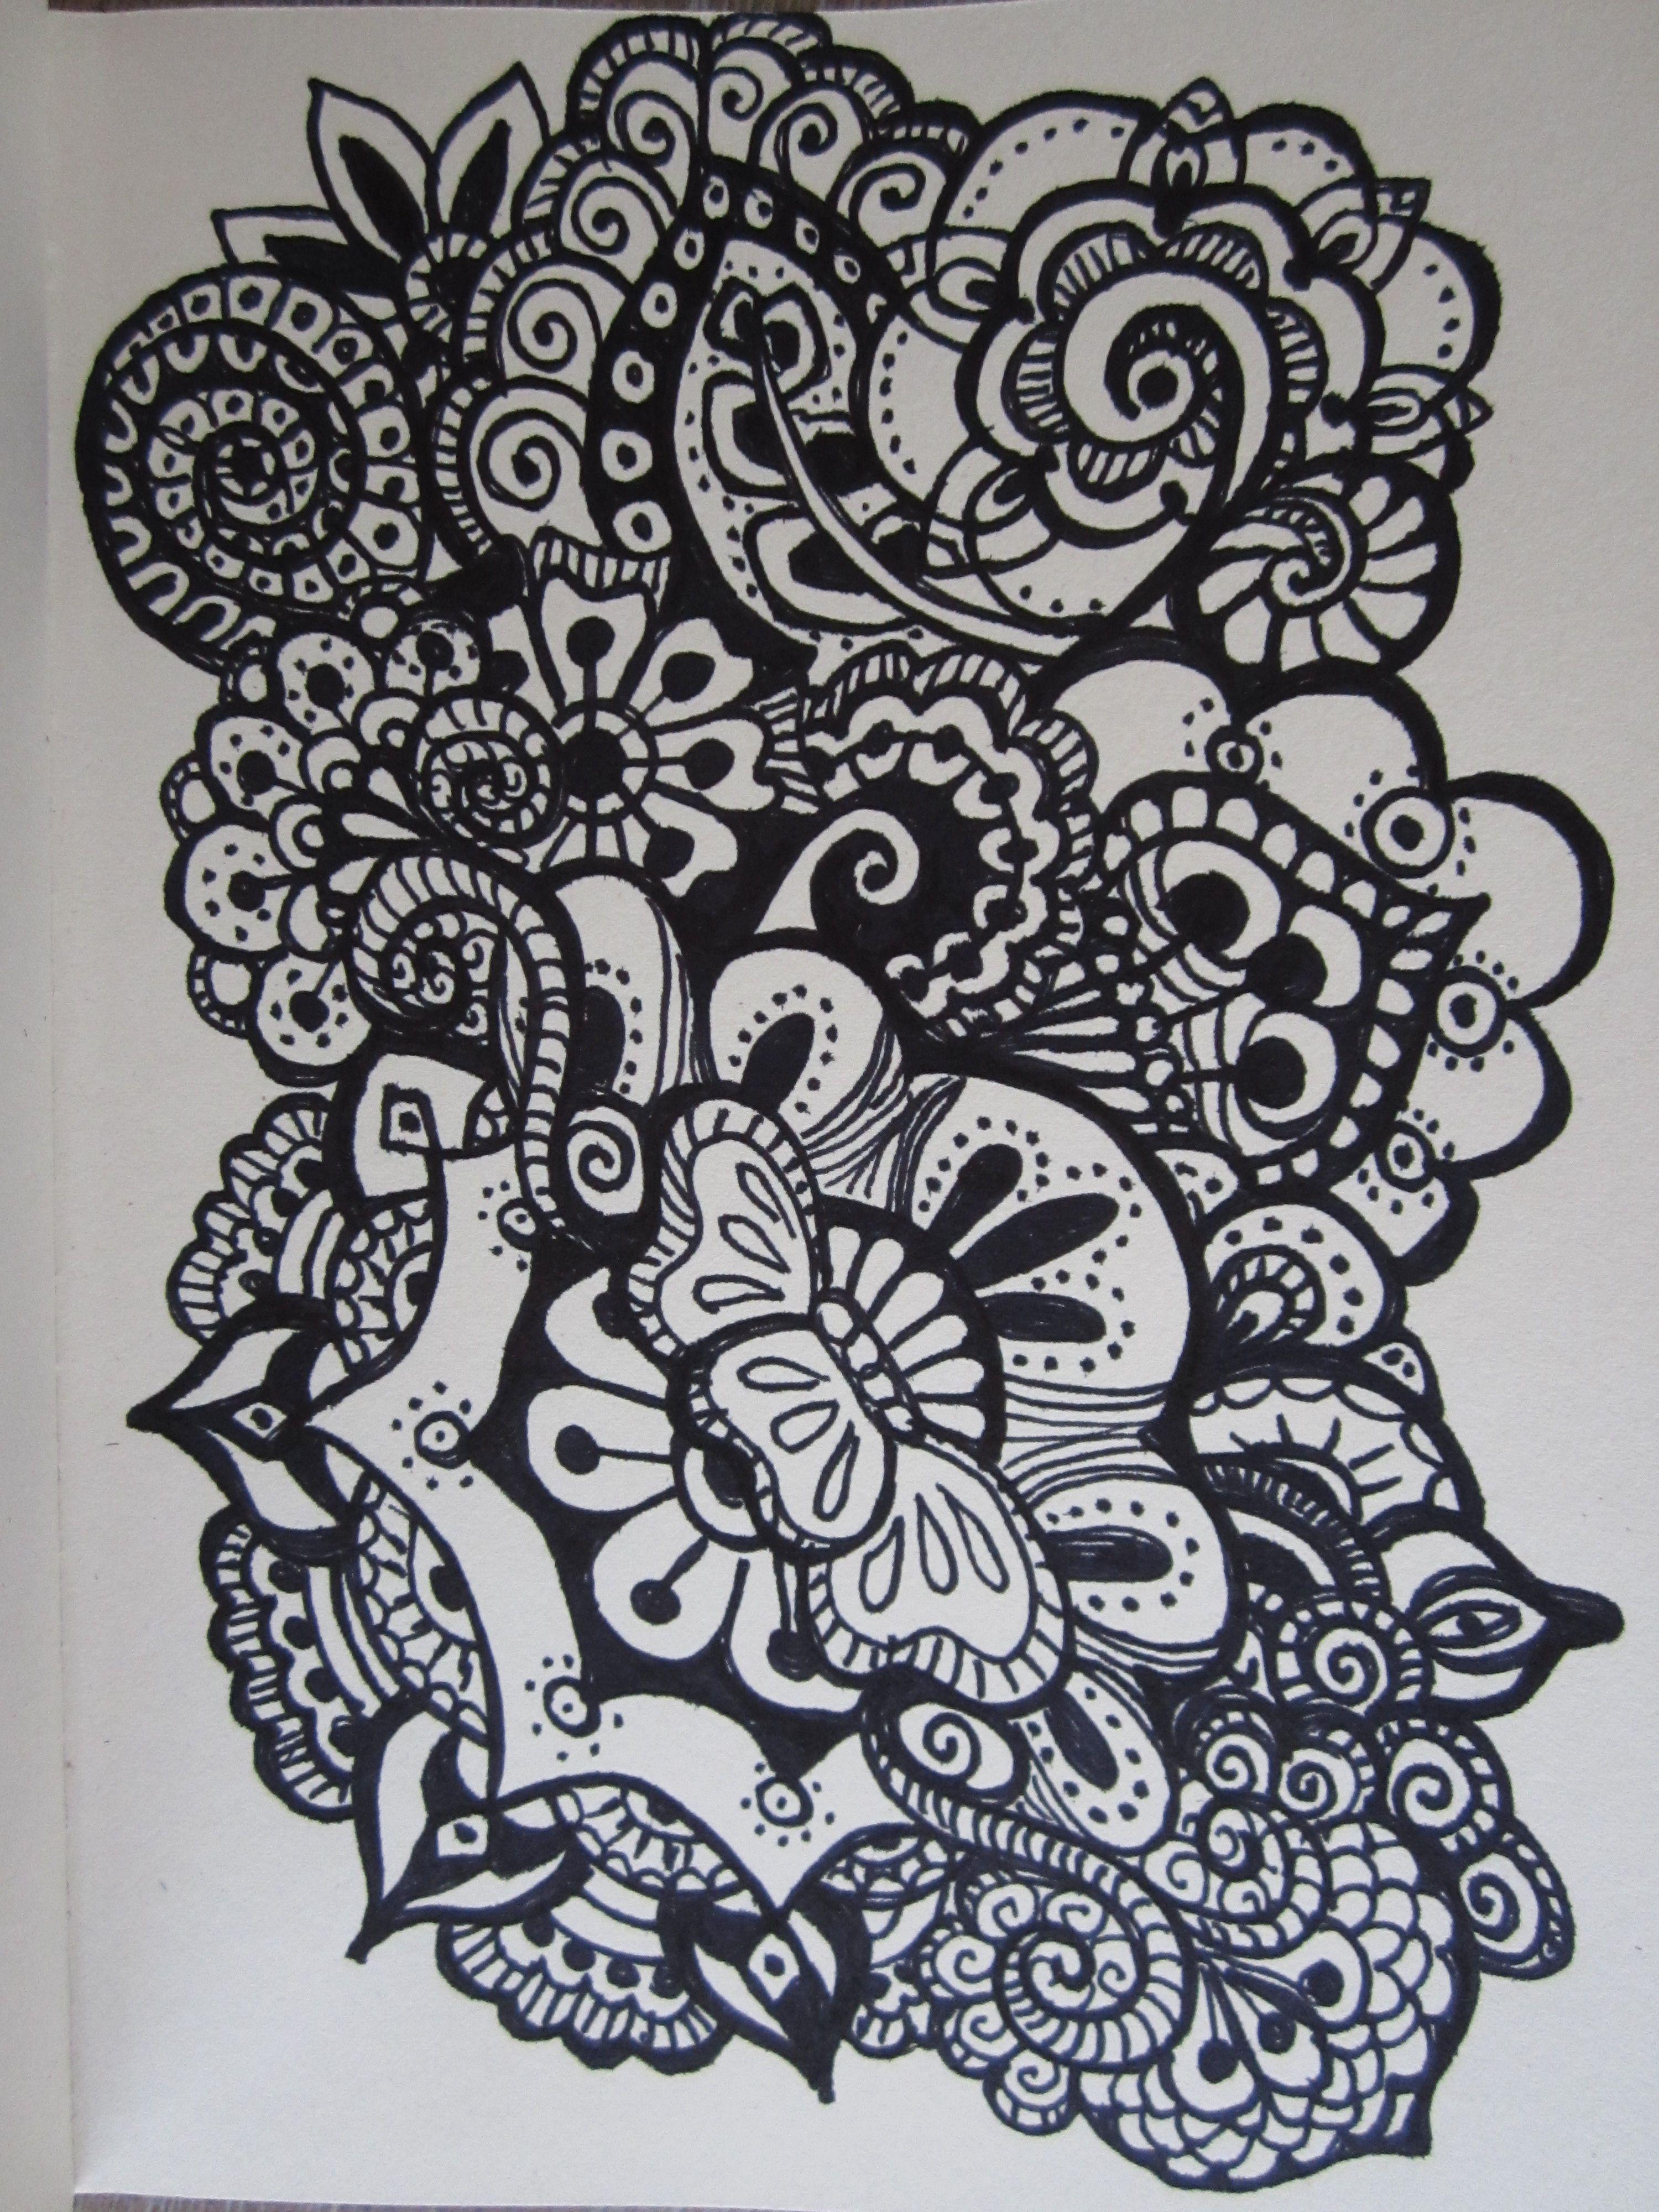 doodle flower - doodle bloem | doodle | Pinterest | Bilder zum malen ...